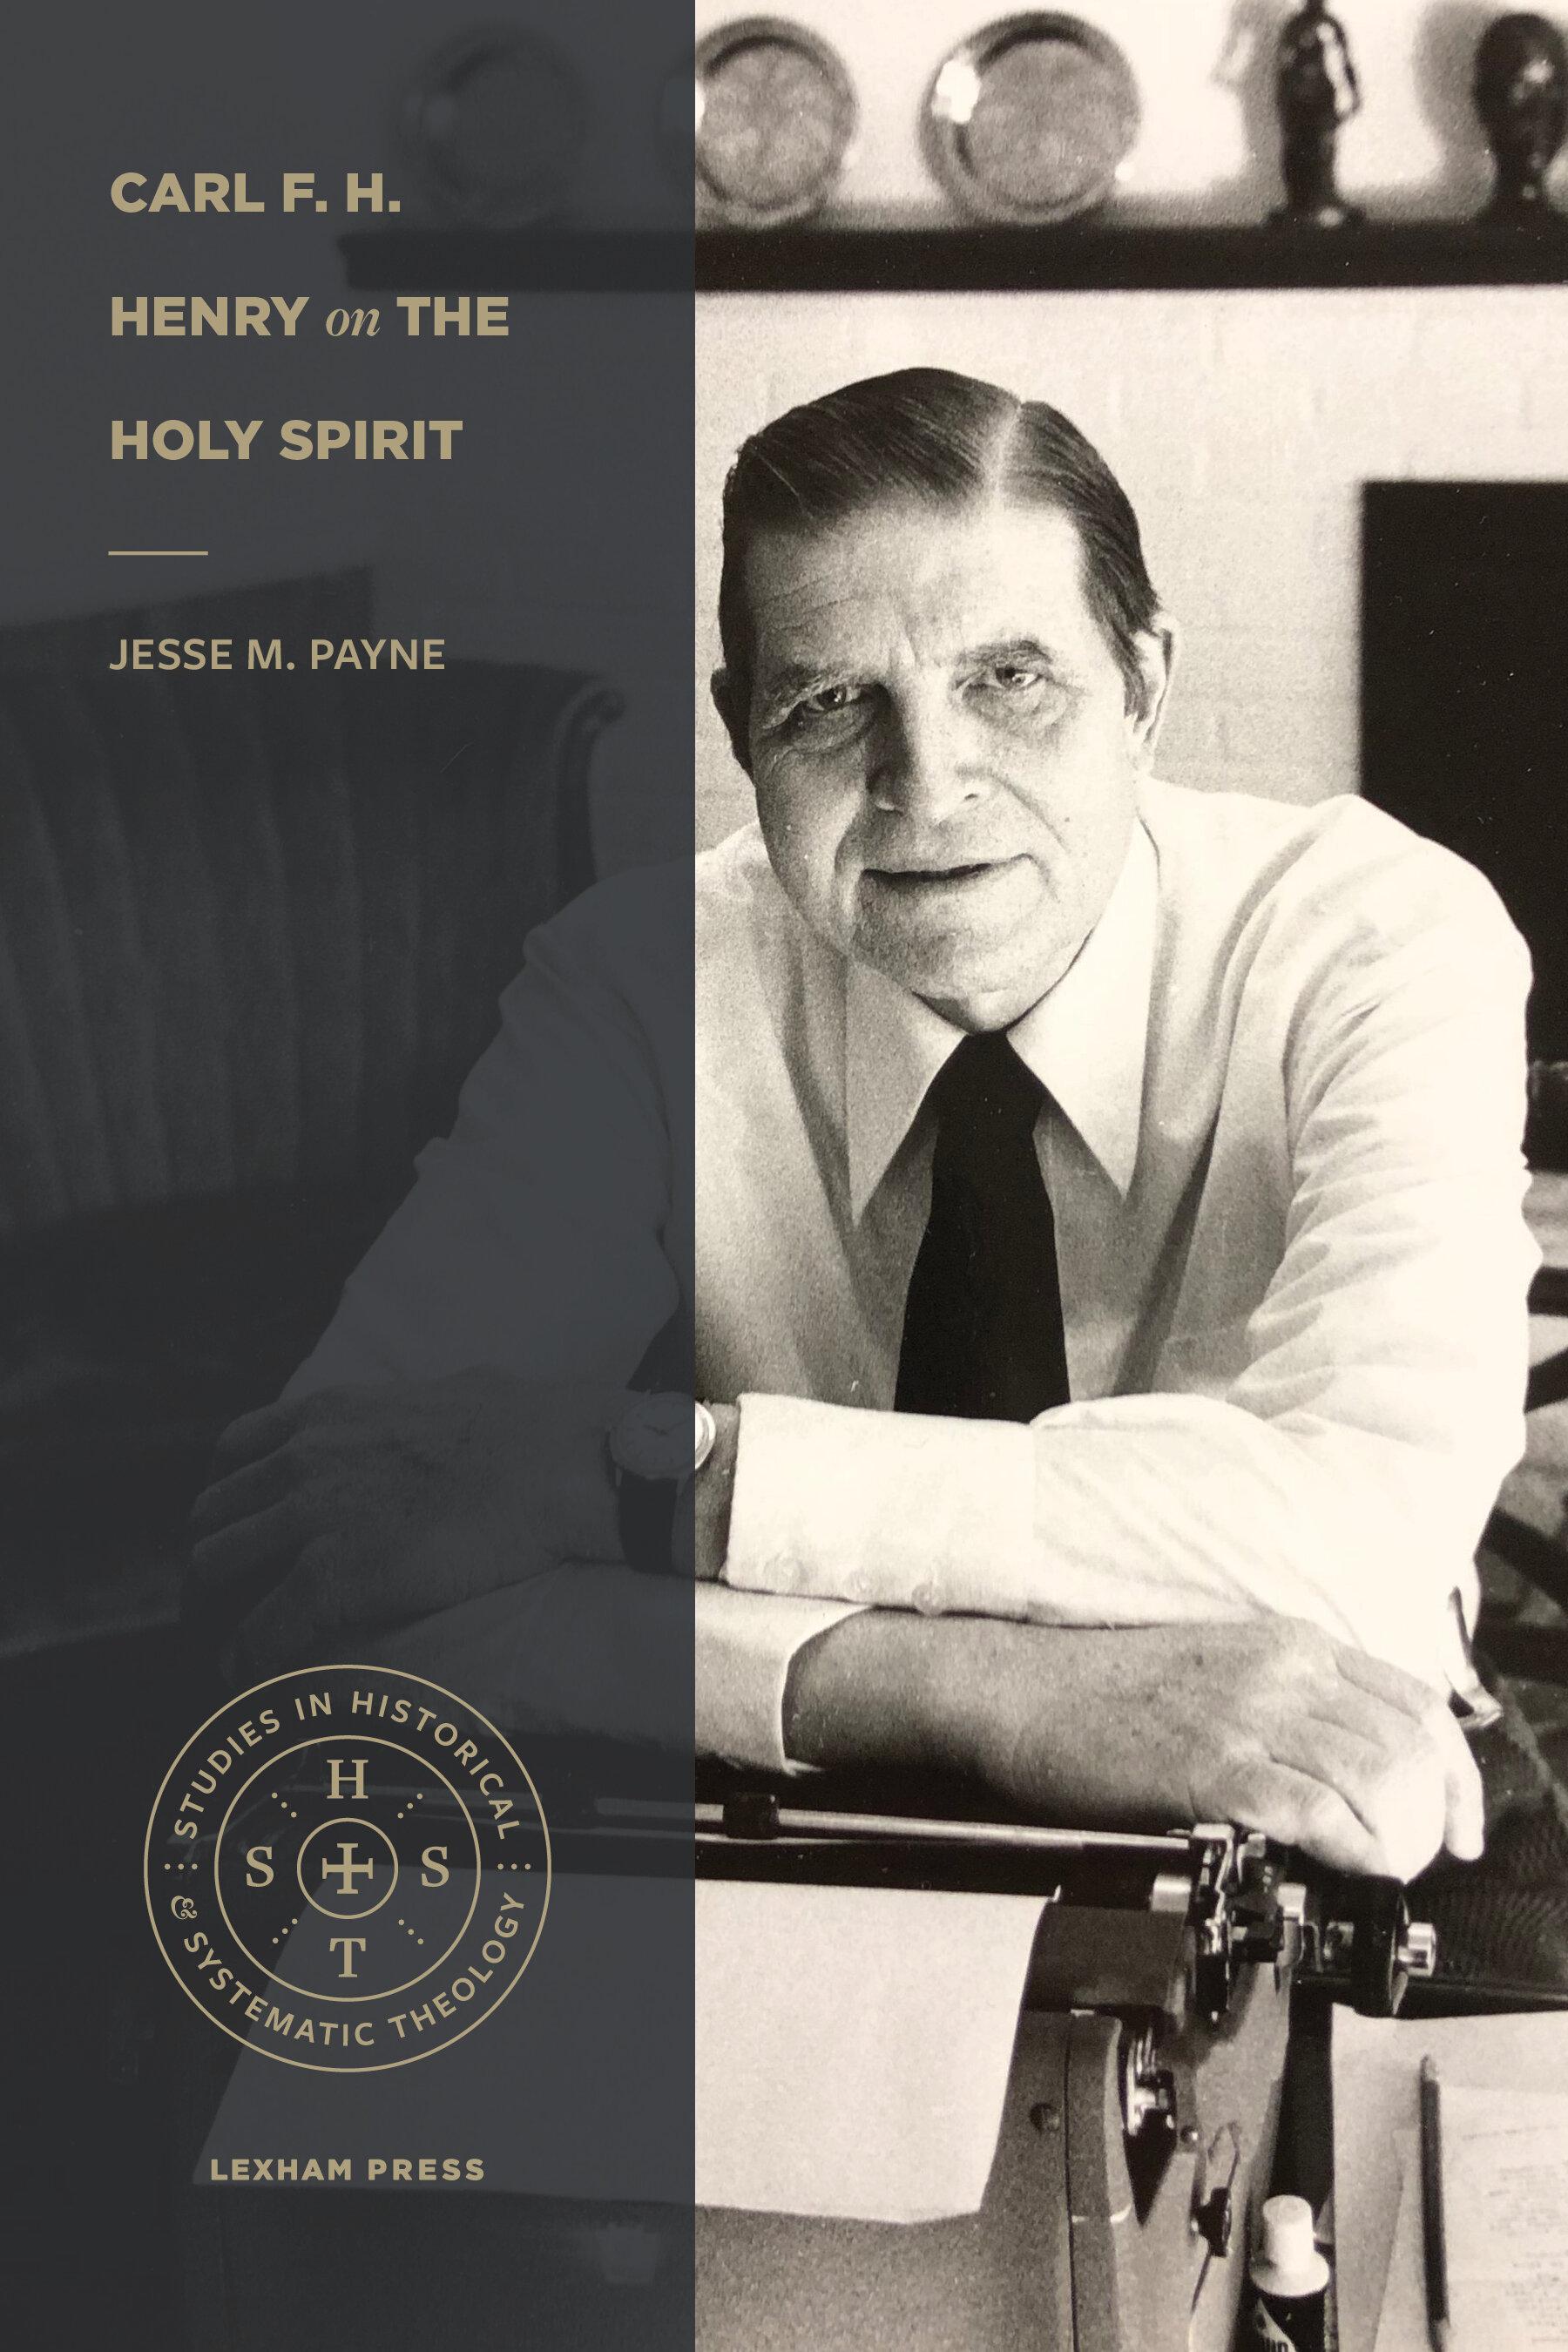 Carl F. H. Henry on the Holy Spirit